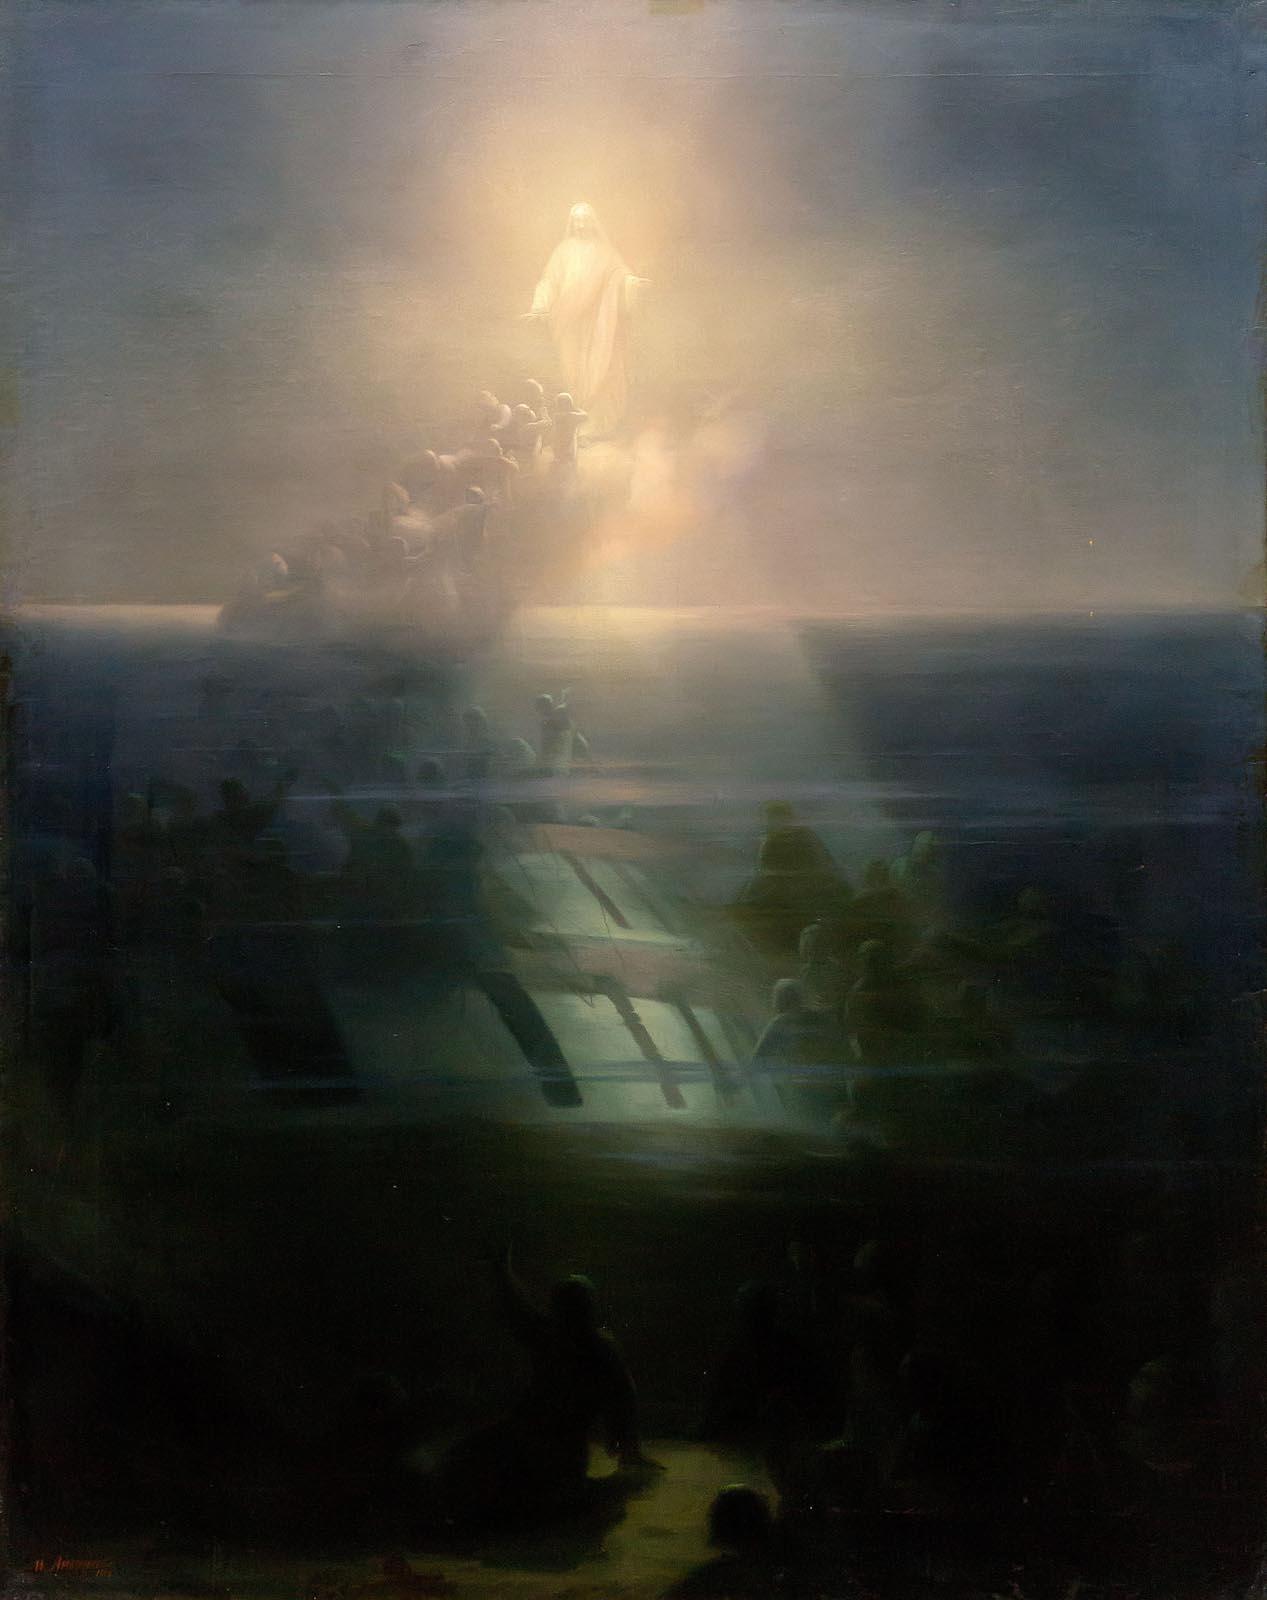 Фото №750697. Айвазовский Иван Константинович. 1817-1900 Гибель корабля «Лефорт». 1858